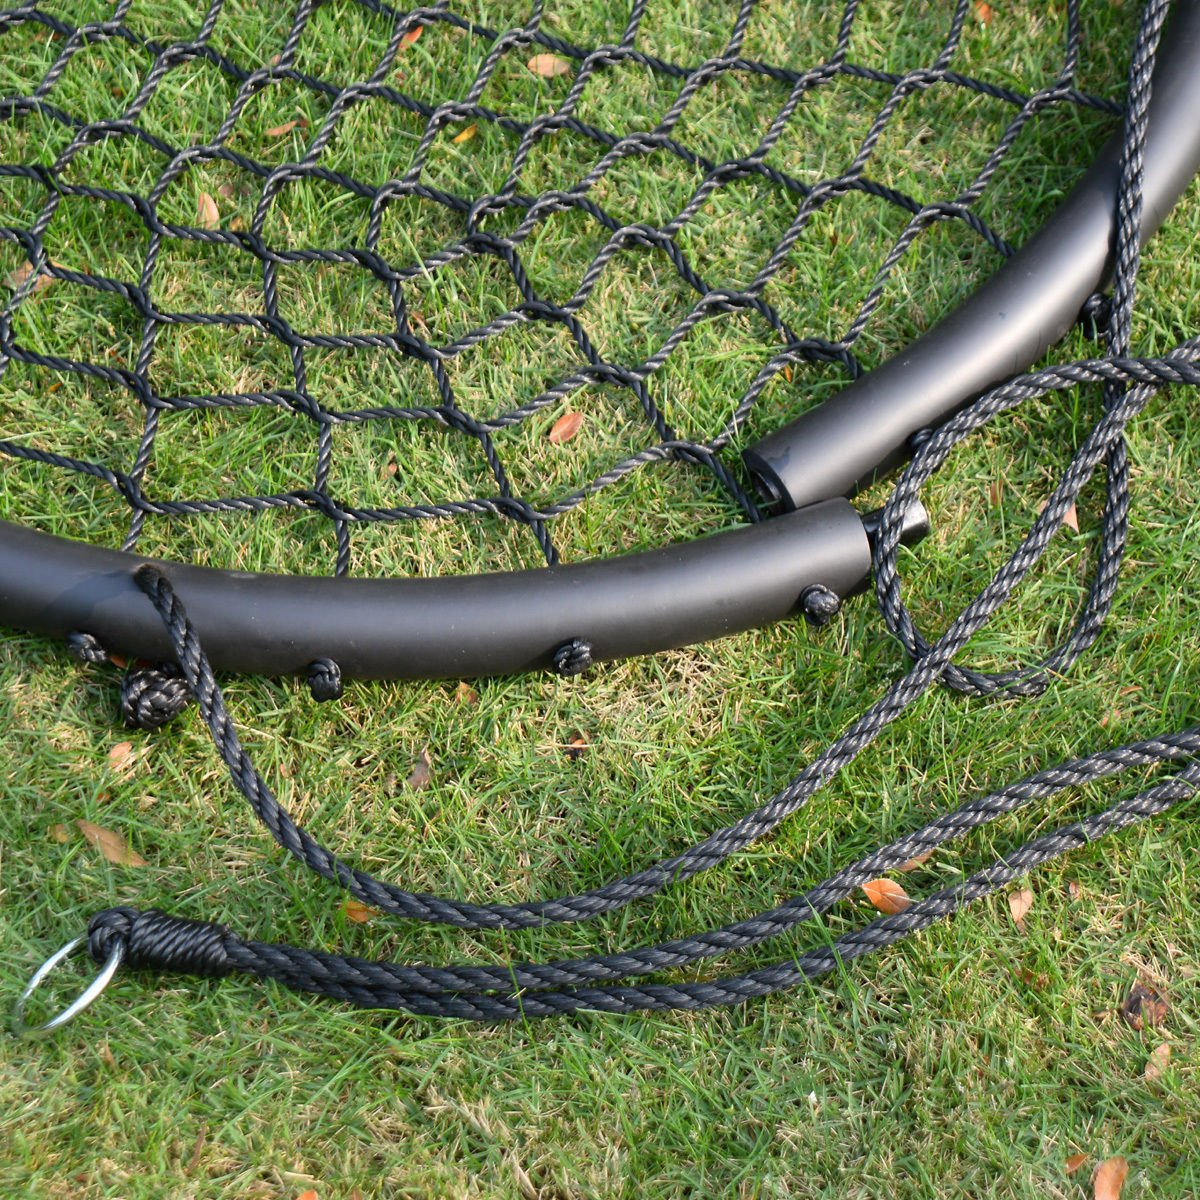 Platform Tree Spider Web Swing Kid Mesh 220 LBS 40'' Wide Hook Hanger Black Standard Web Hangers - House Deals by House Deals (Image #5)